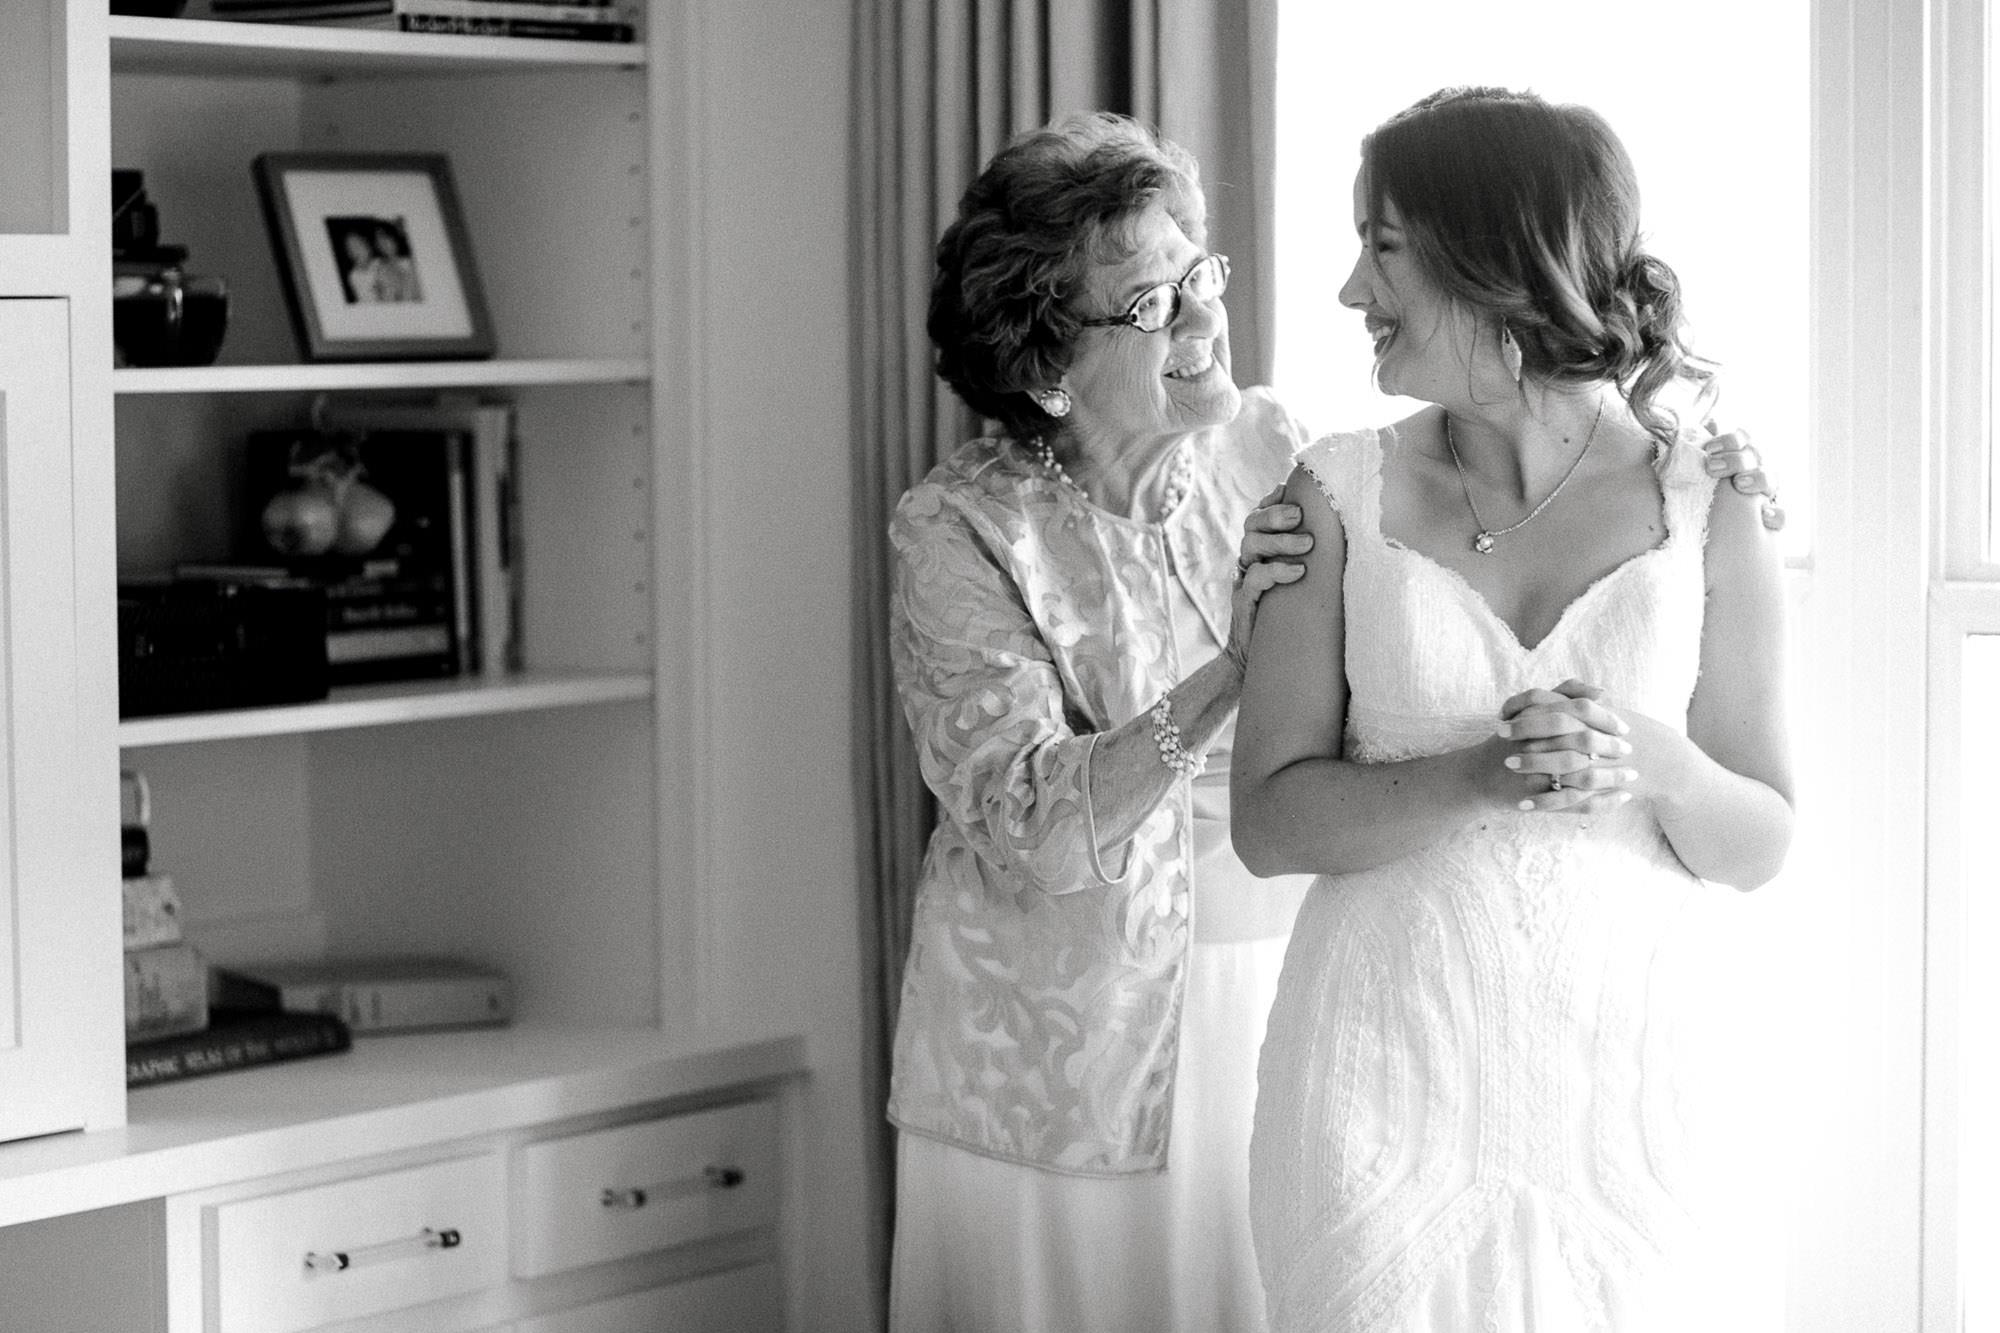 alexis-joel-laury-lubbock-weddingphotographer-alleej0007.jpg